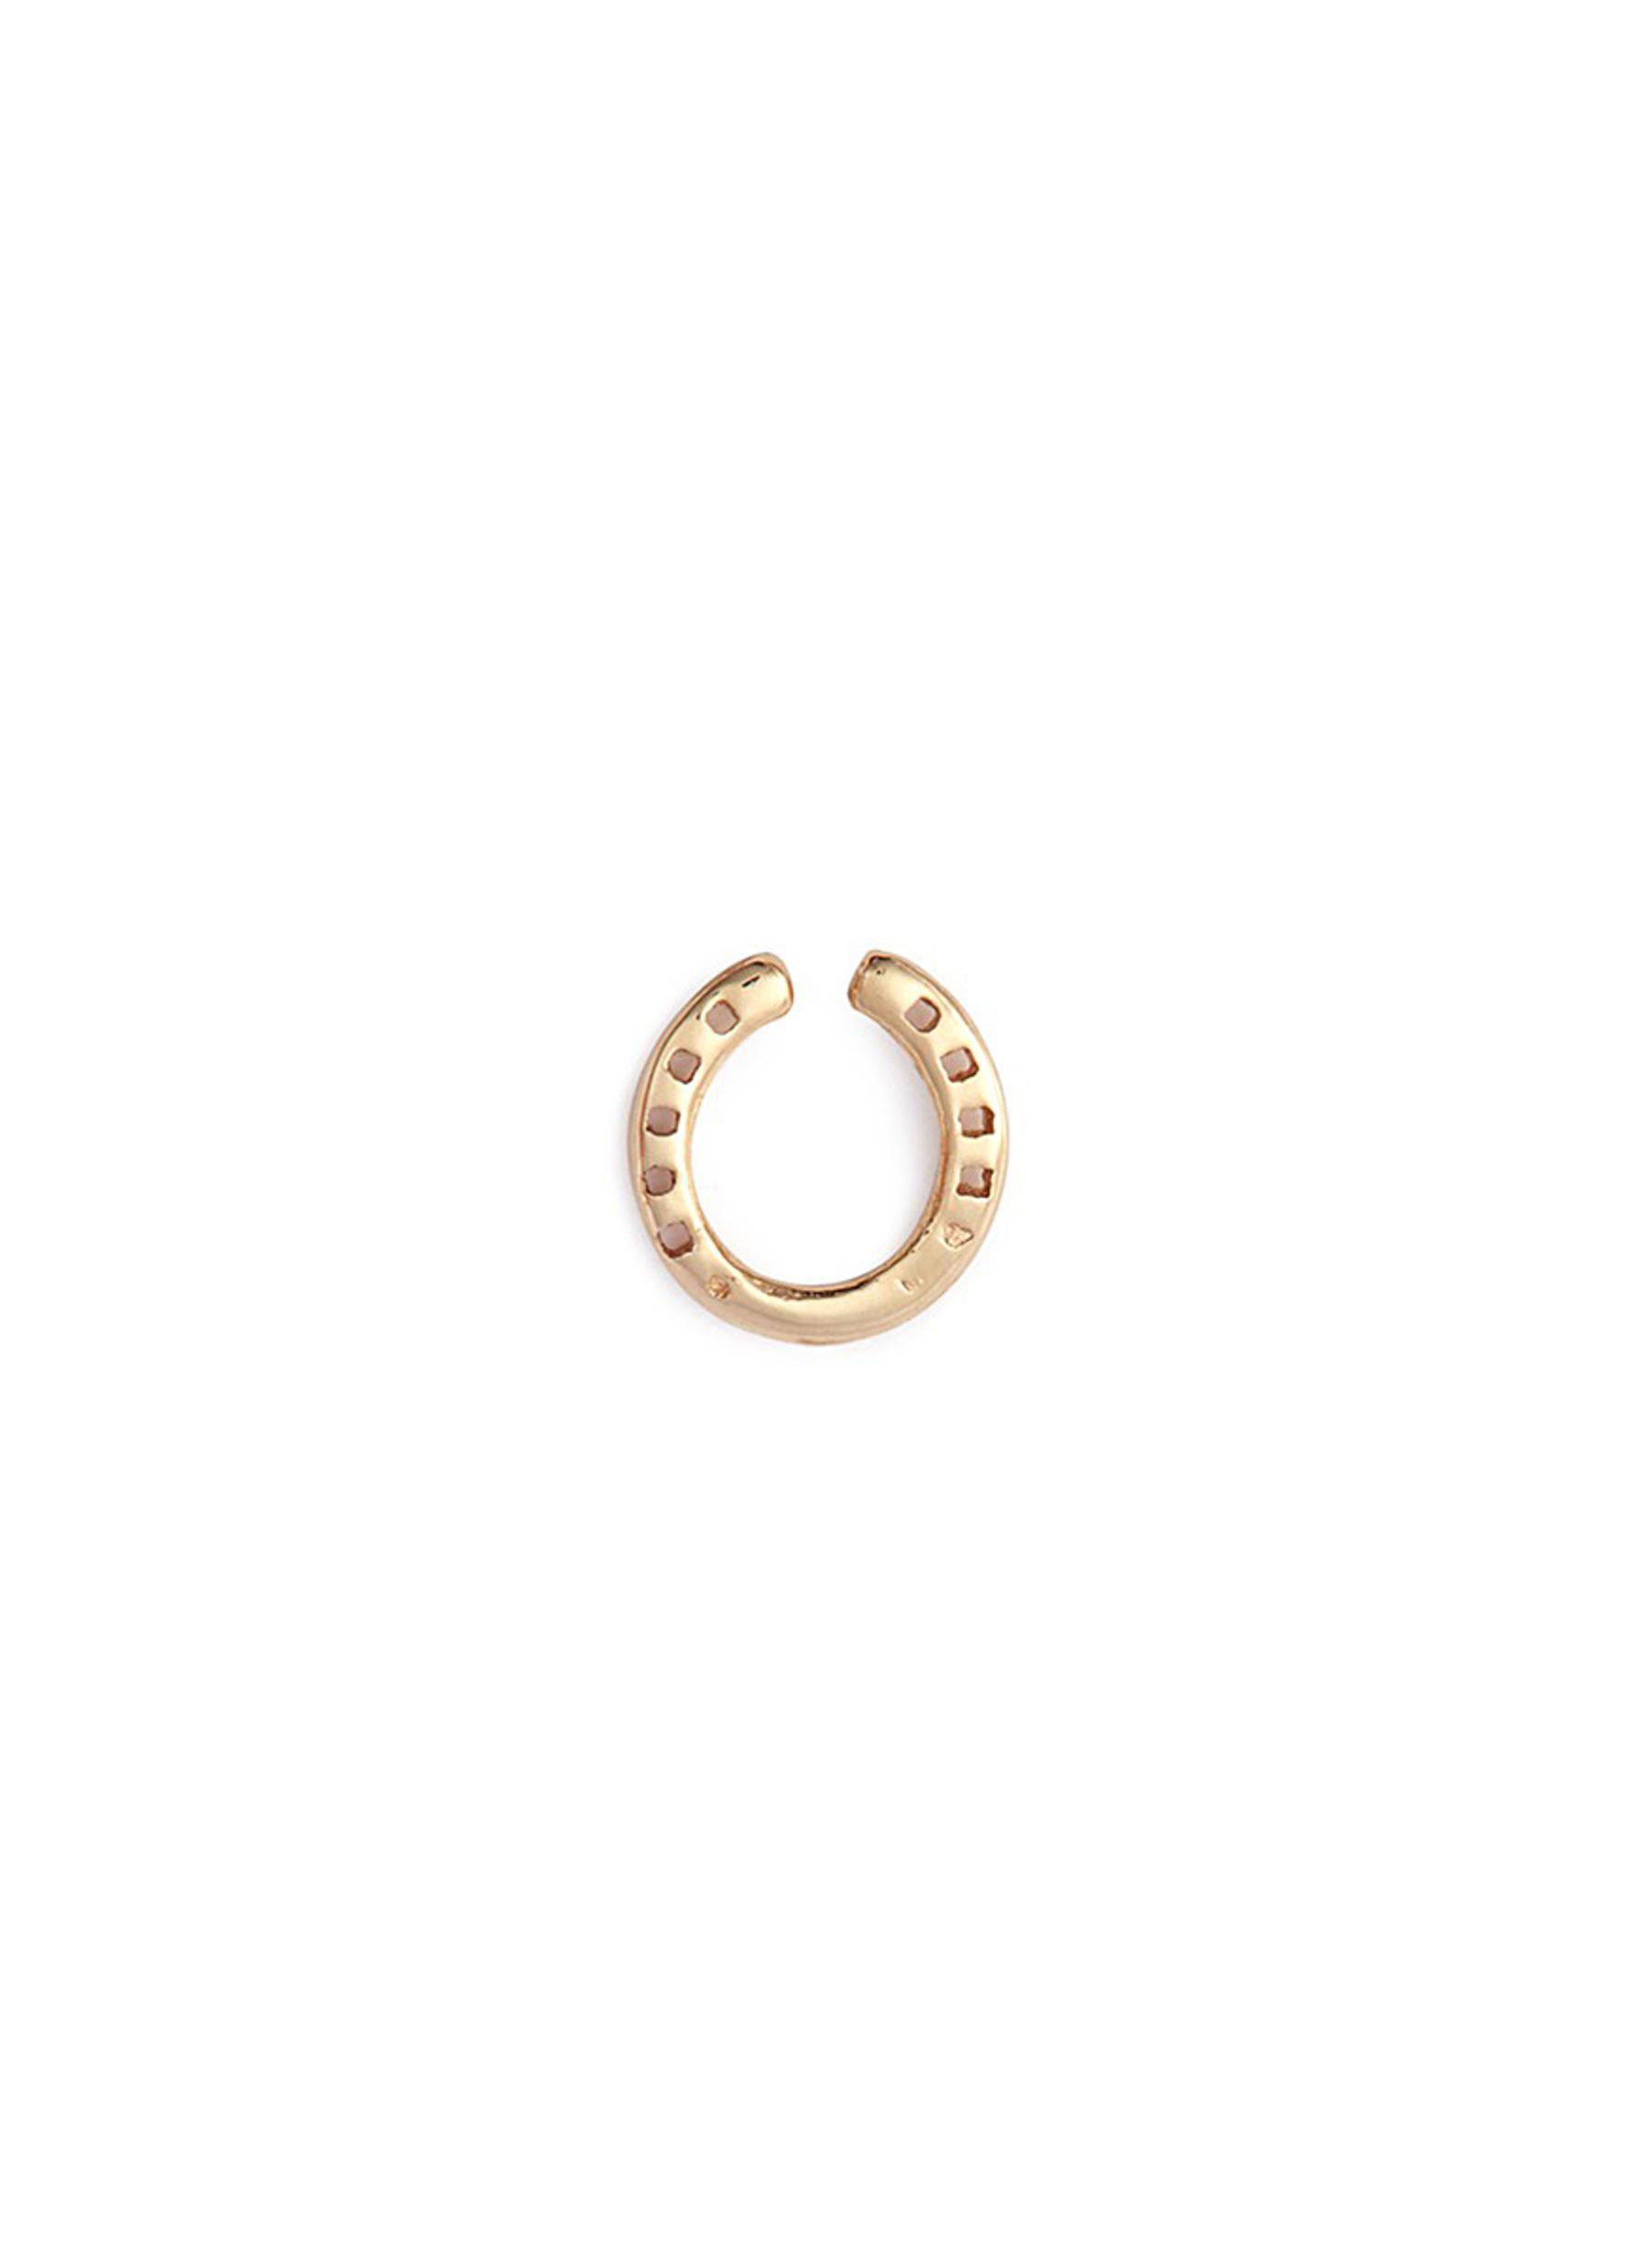 14k yellow gold shell charm bracelet Loquet London 7NZlCCW4